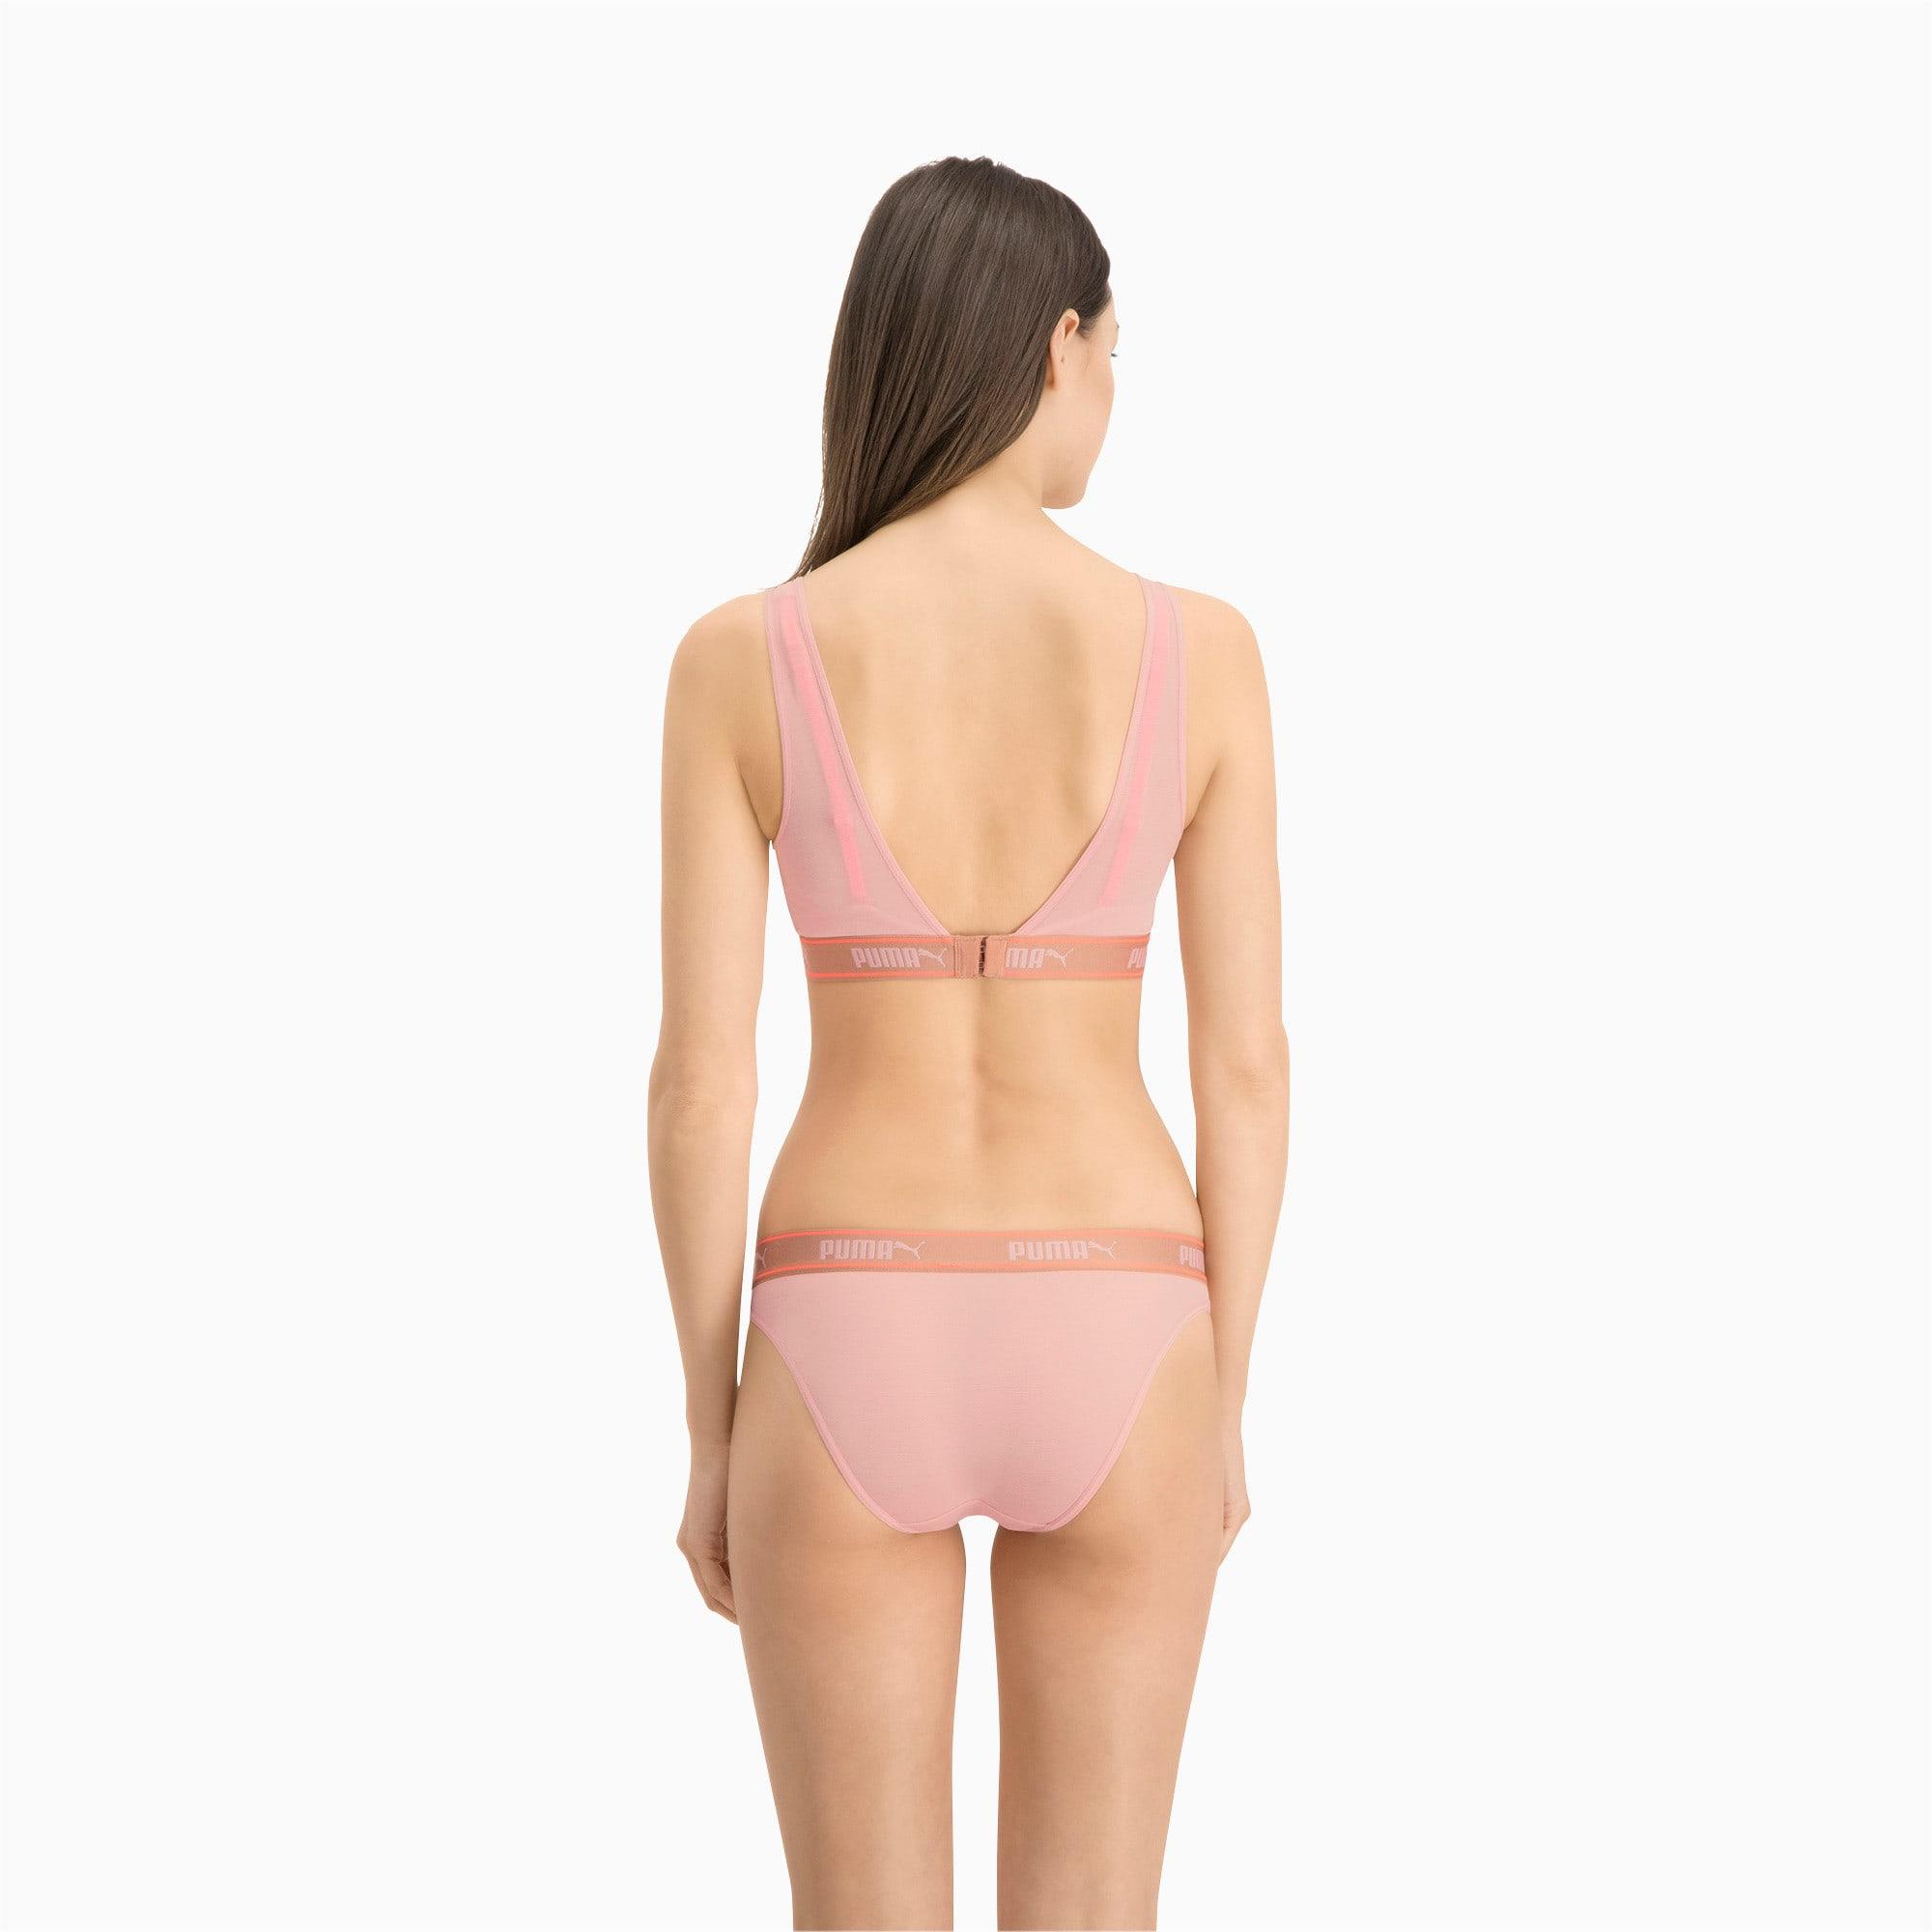 Thumbnail 4 of Lot de deux slips bikini Mesh pour femme, pink, medium